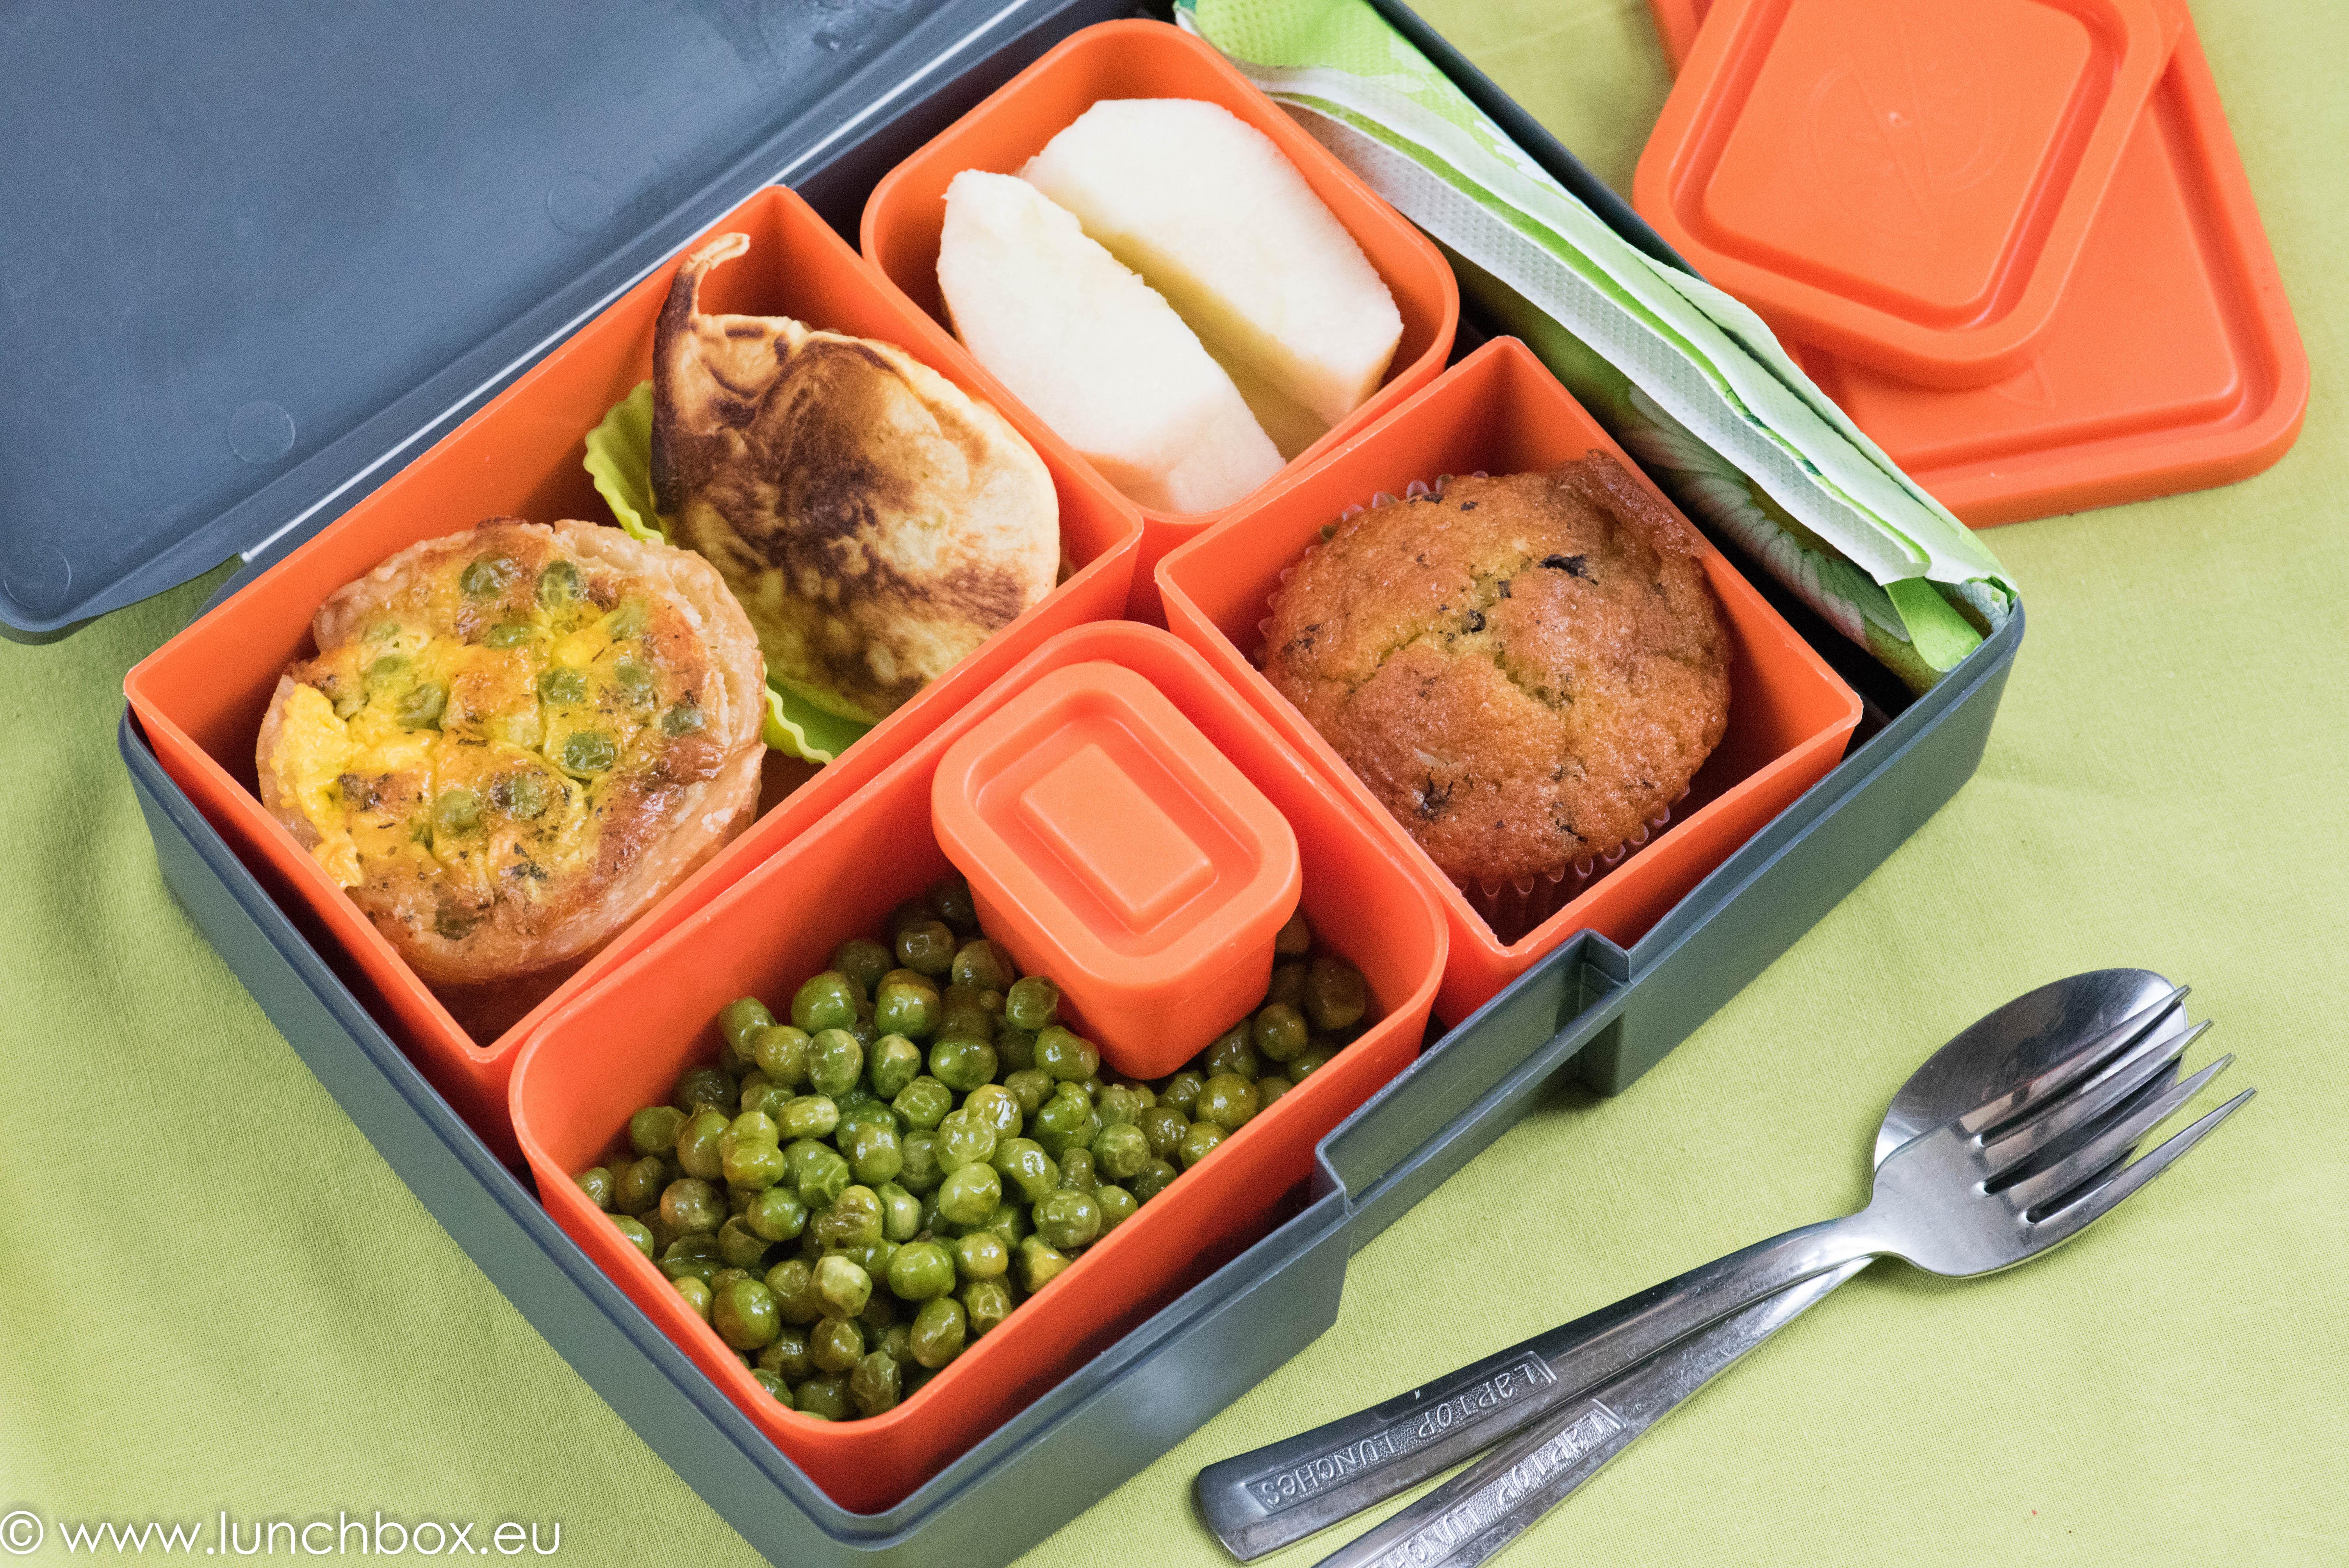 Lunchbox menu exotic